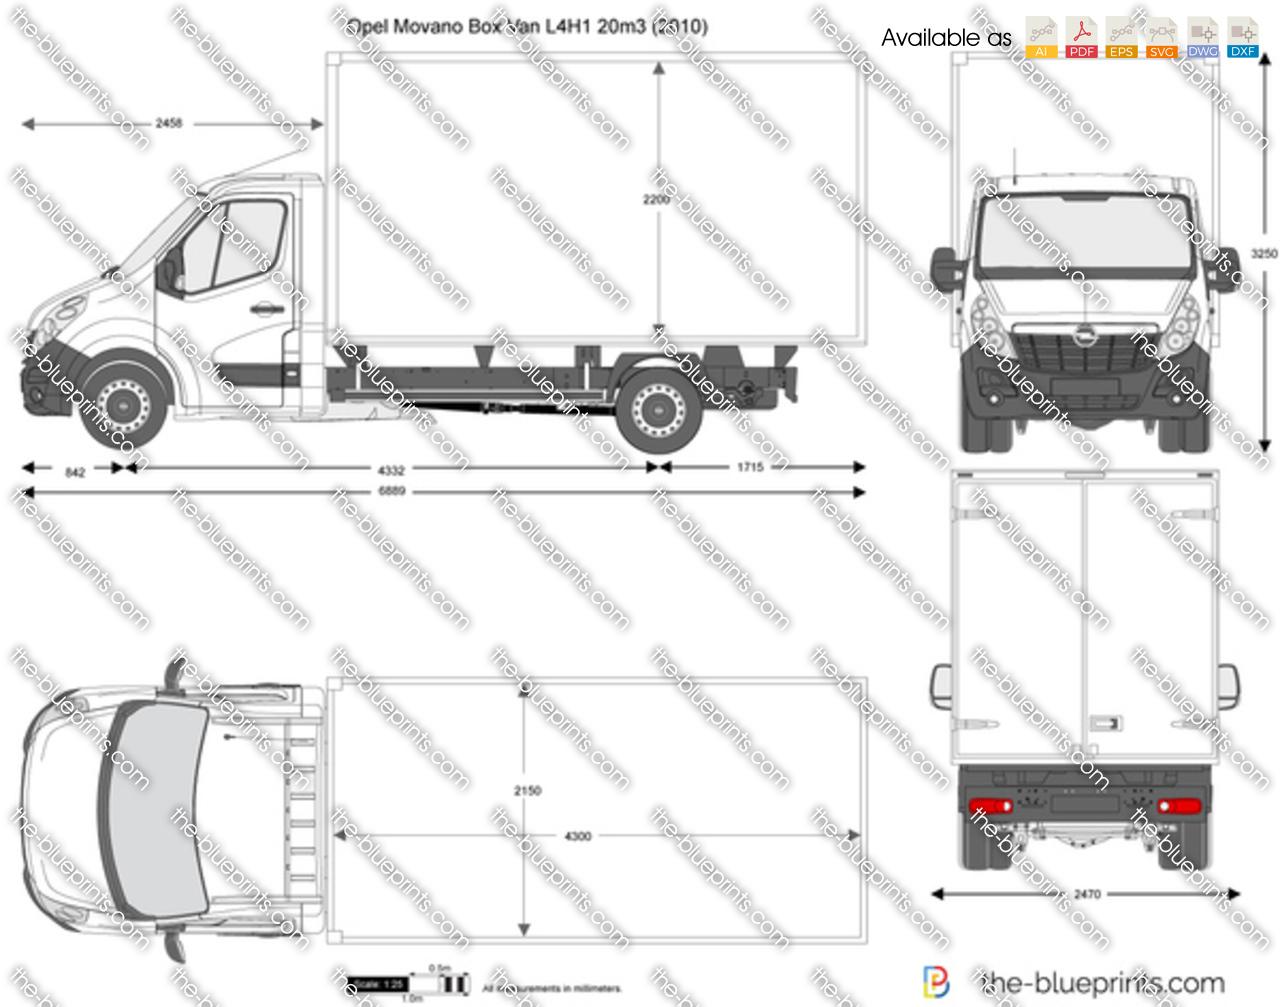 Opel Movano Box Van L4h1 20m3 Vector Drawing